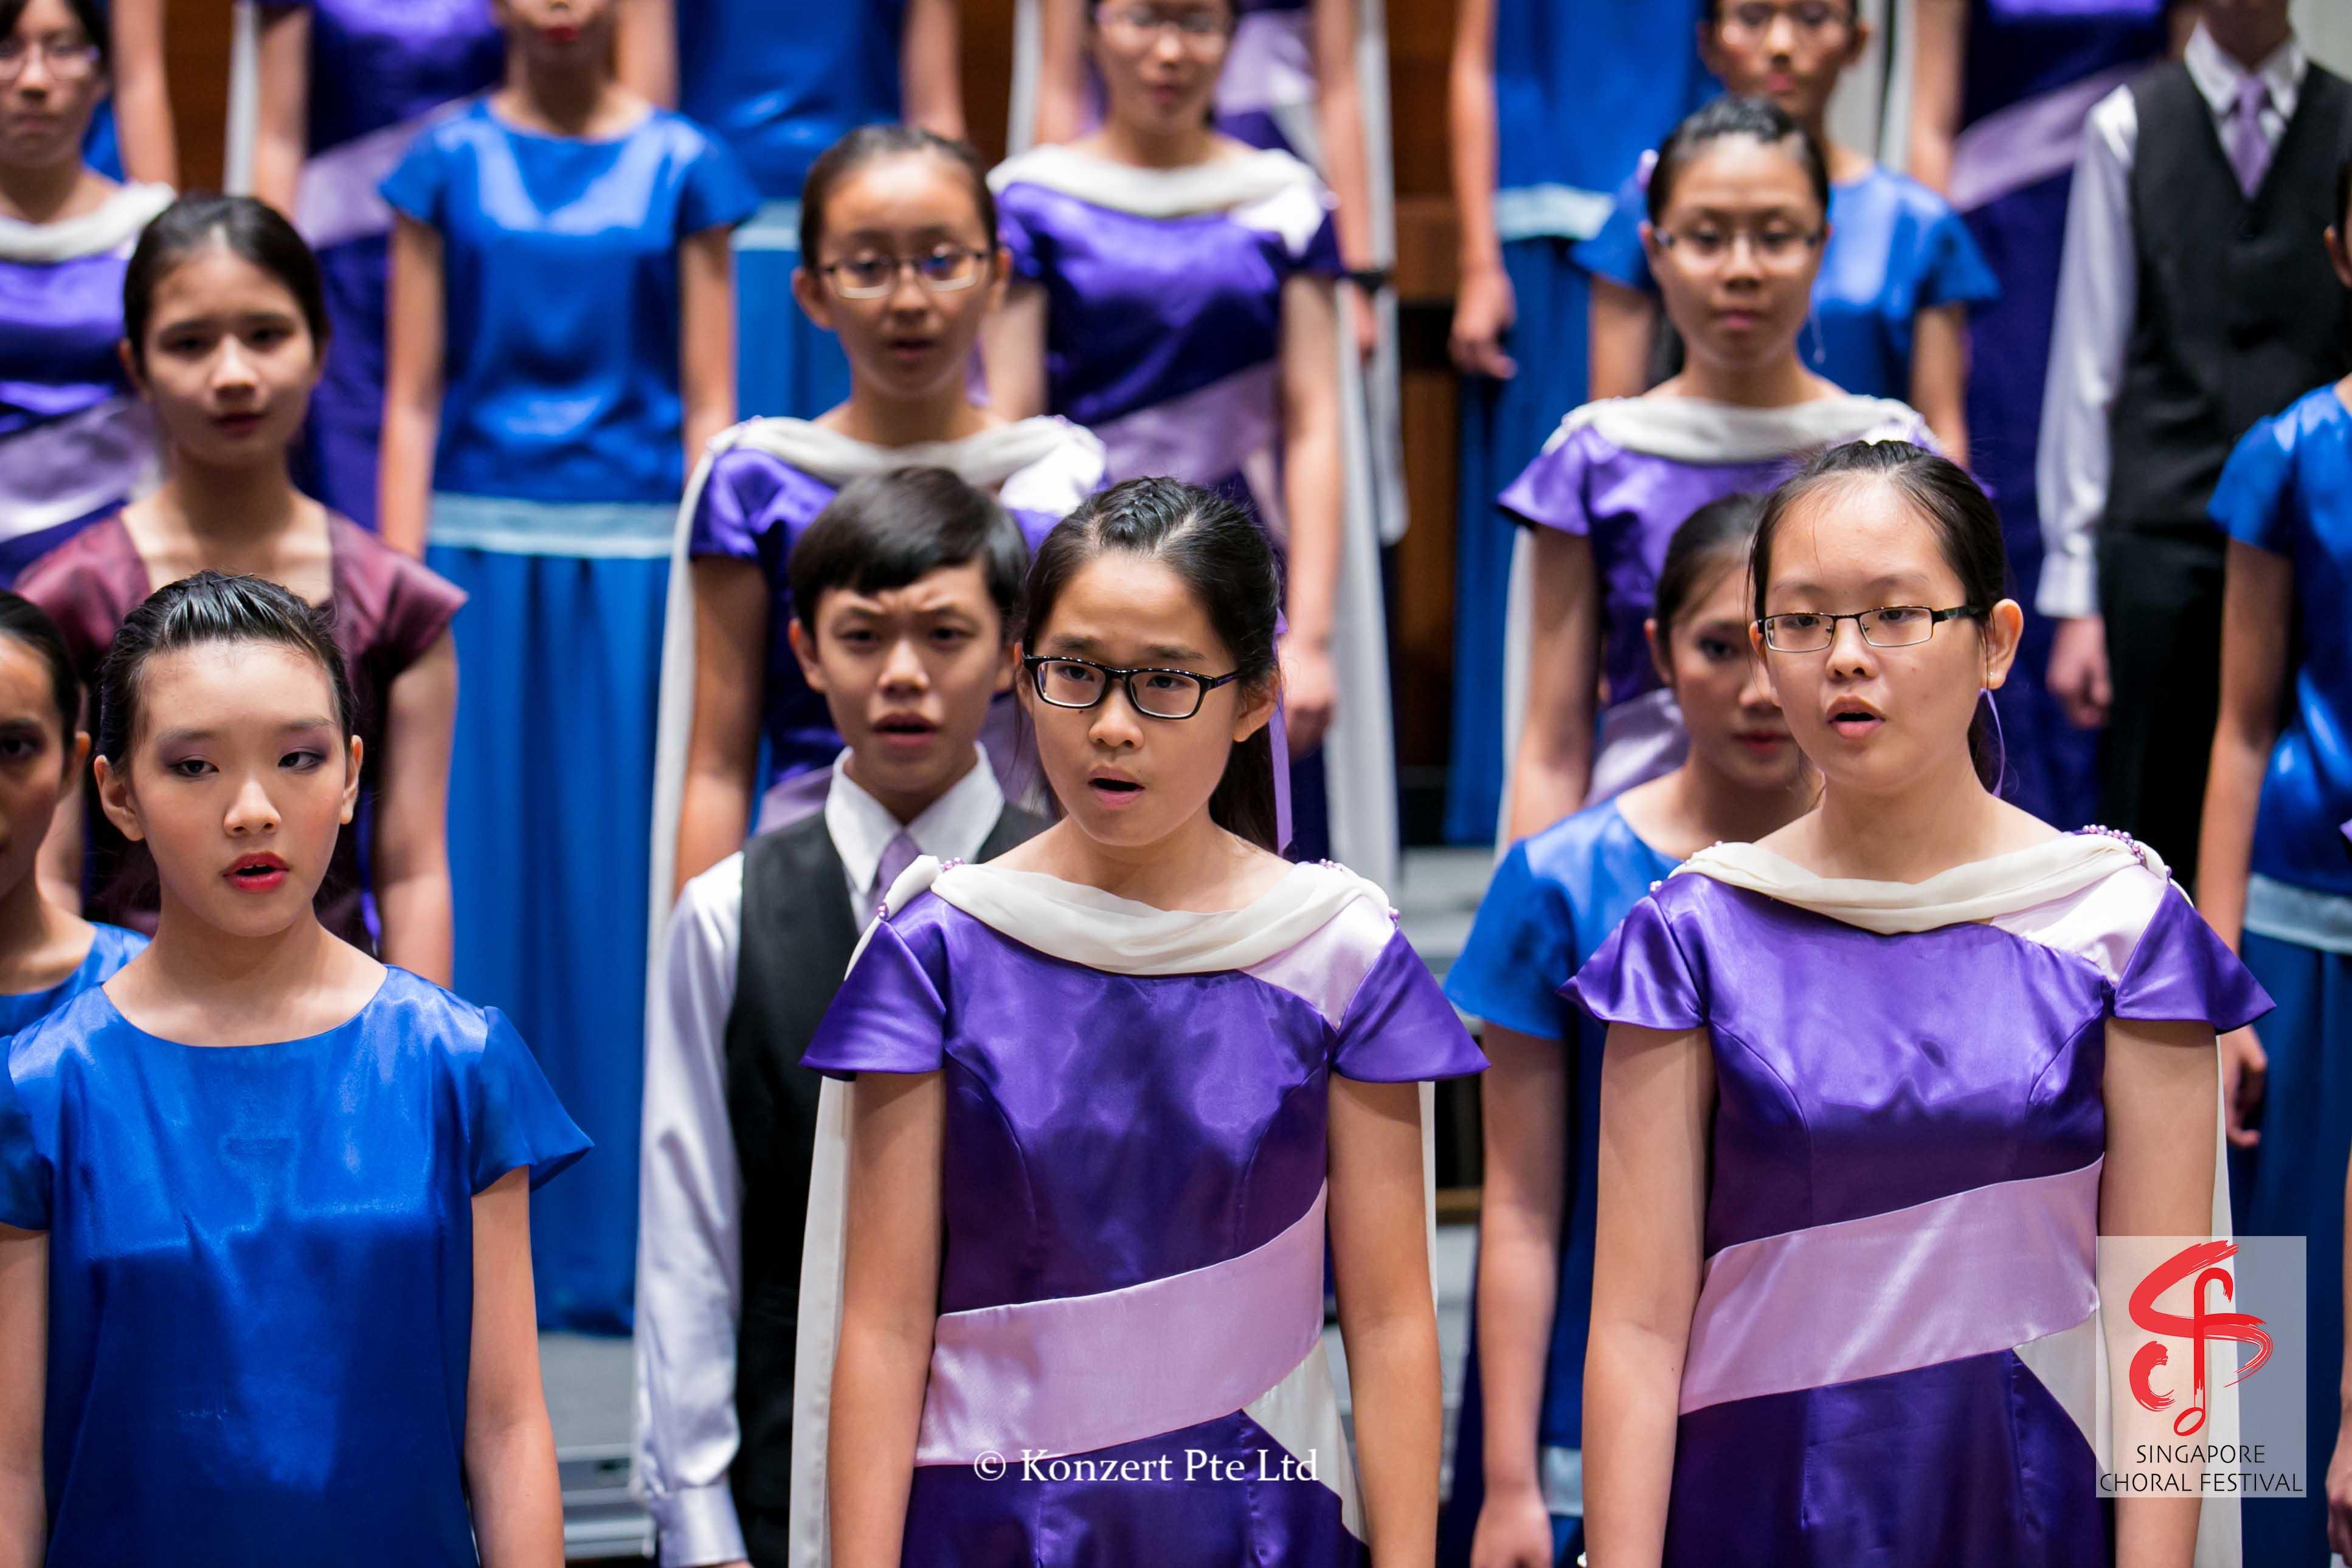 Singapore Choral Festival 7-8-15 (95).jpg